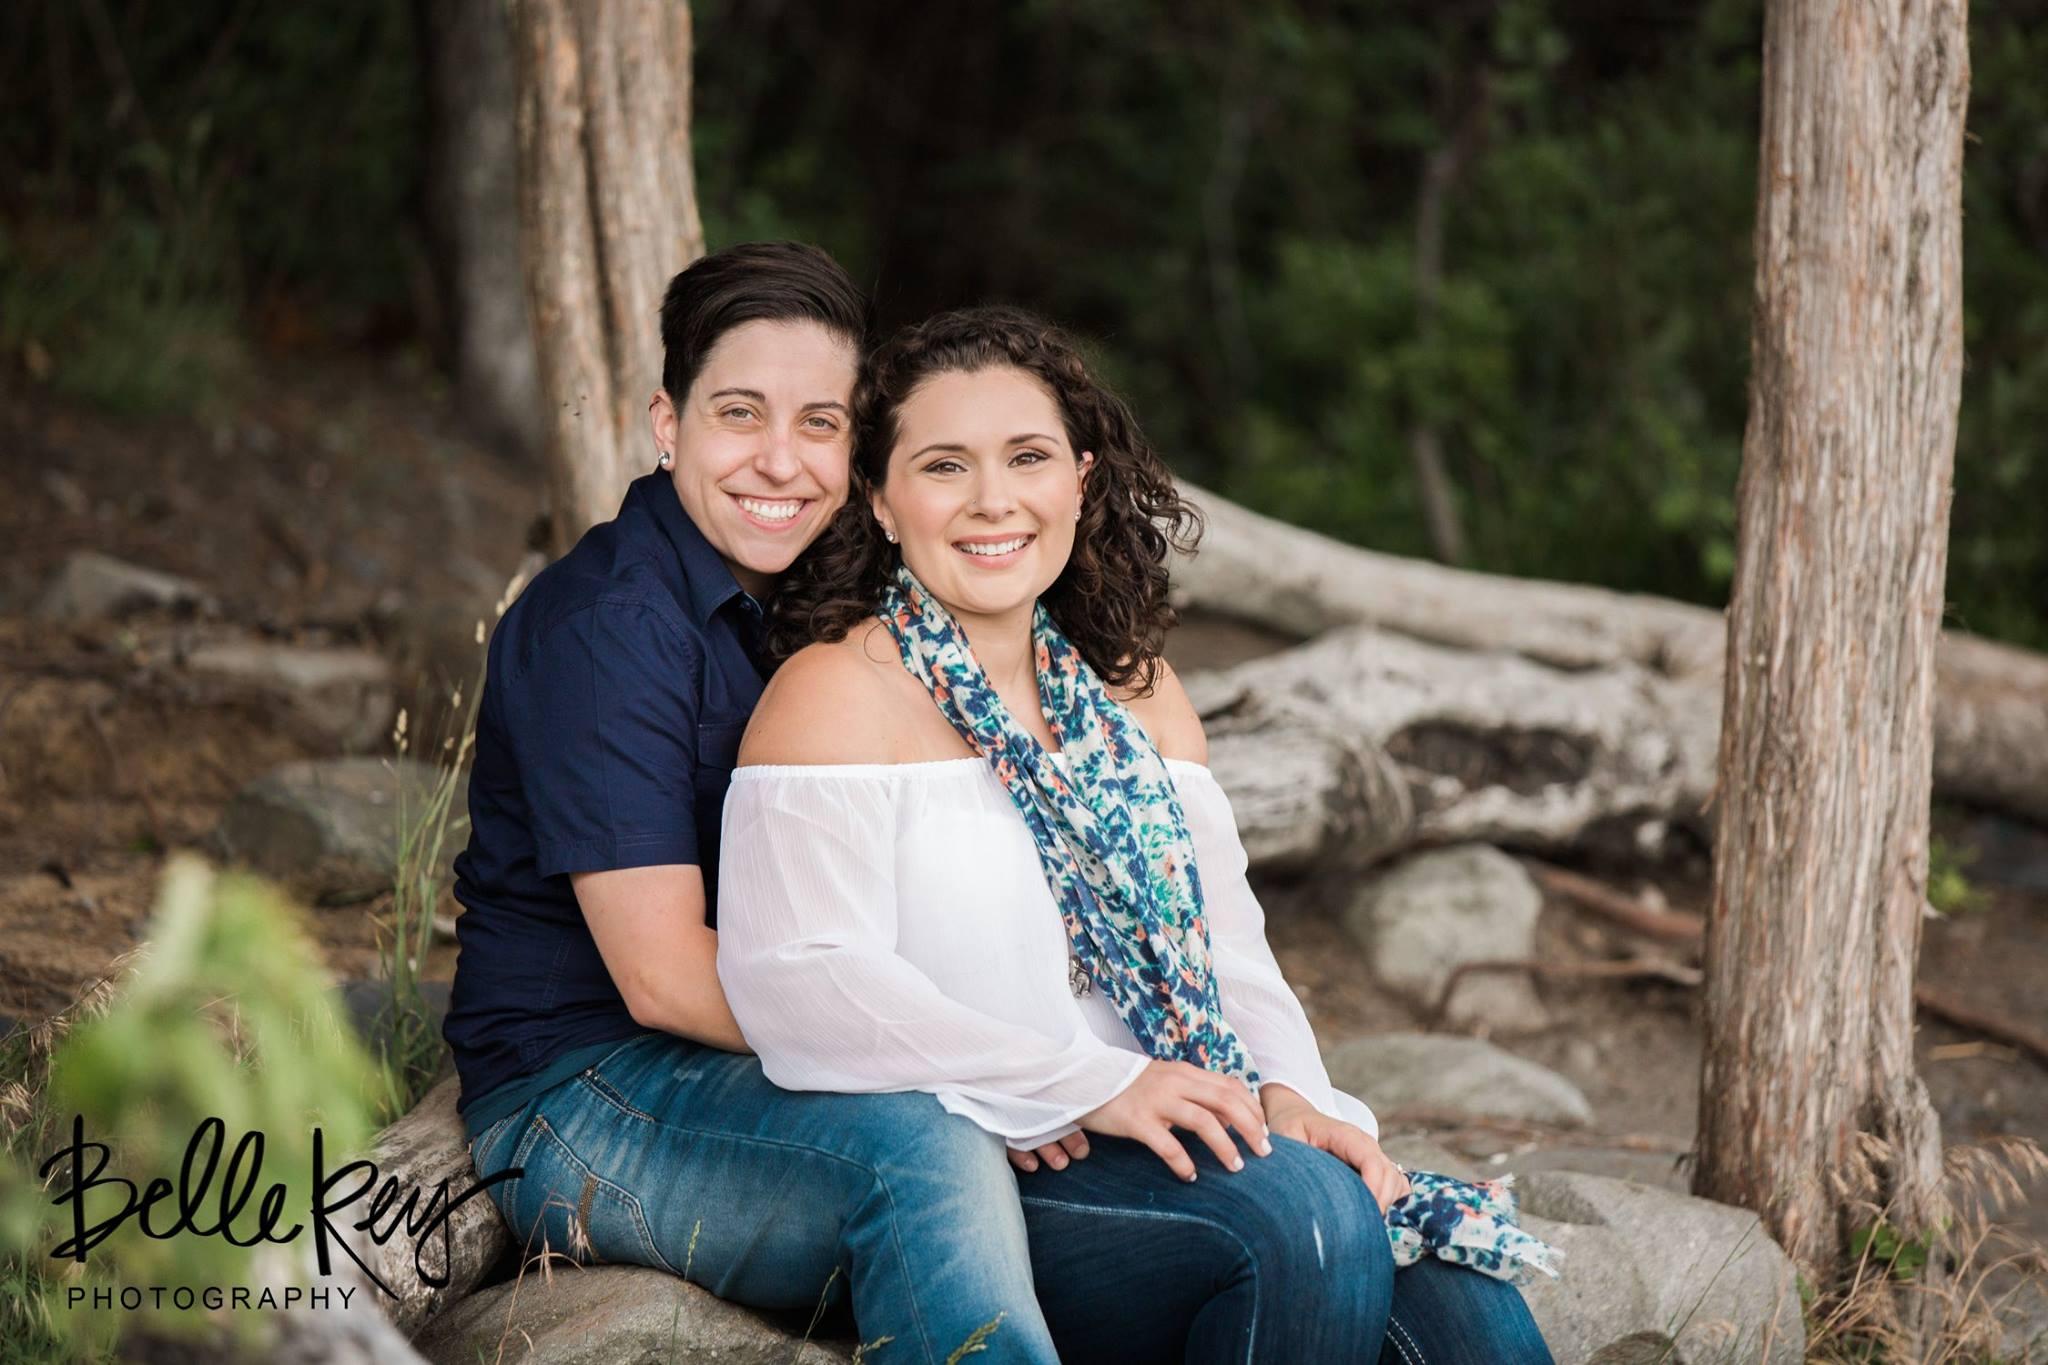 Michaela and Norah's engagement